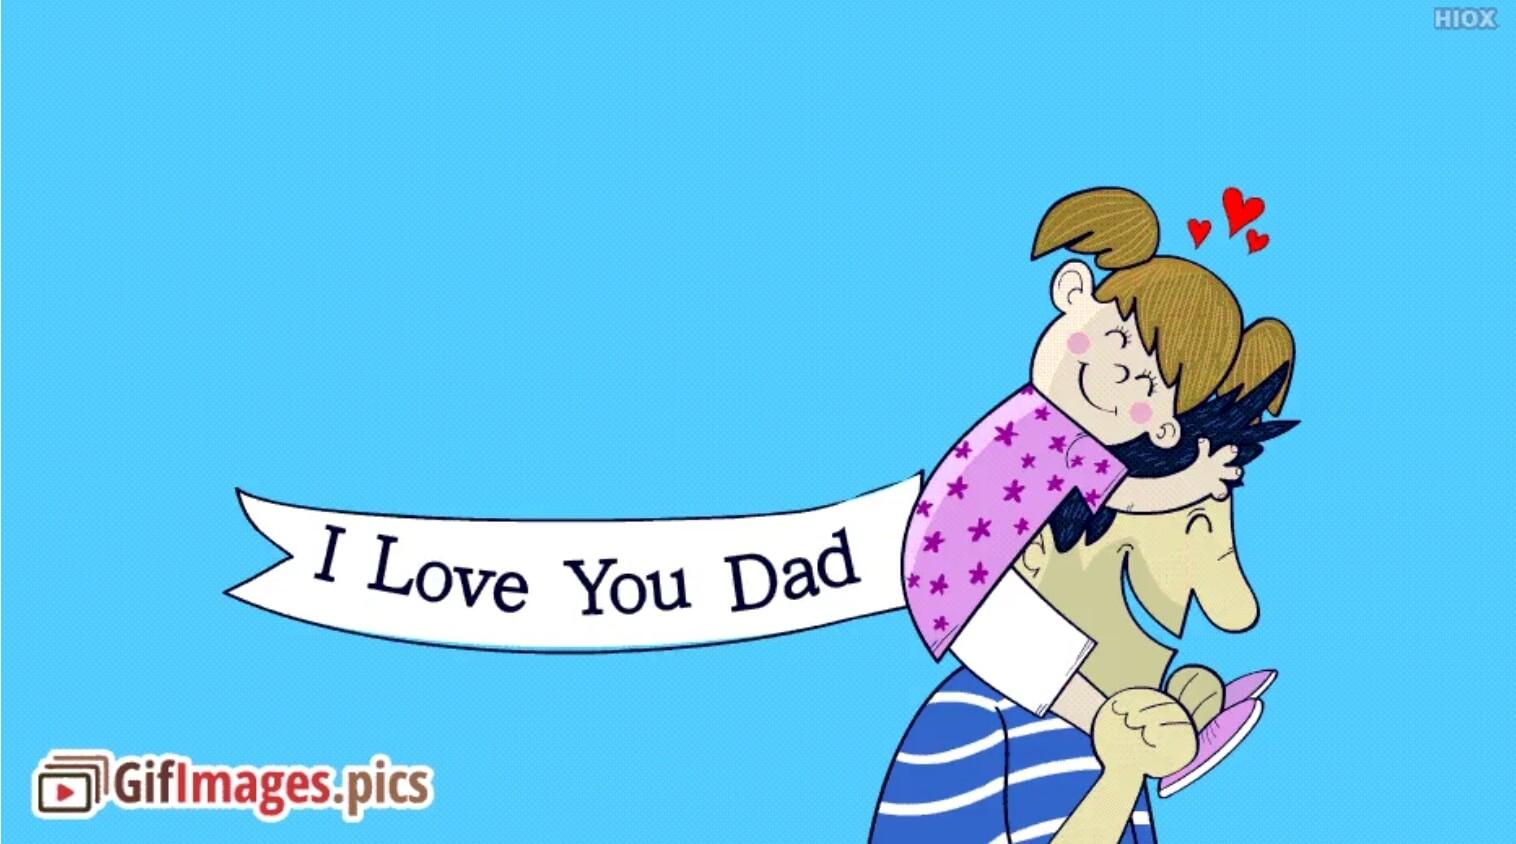 دوستت دارم پدرم | i love you dad